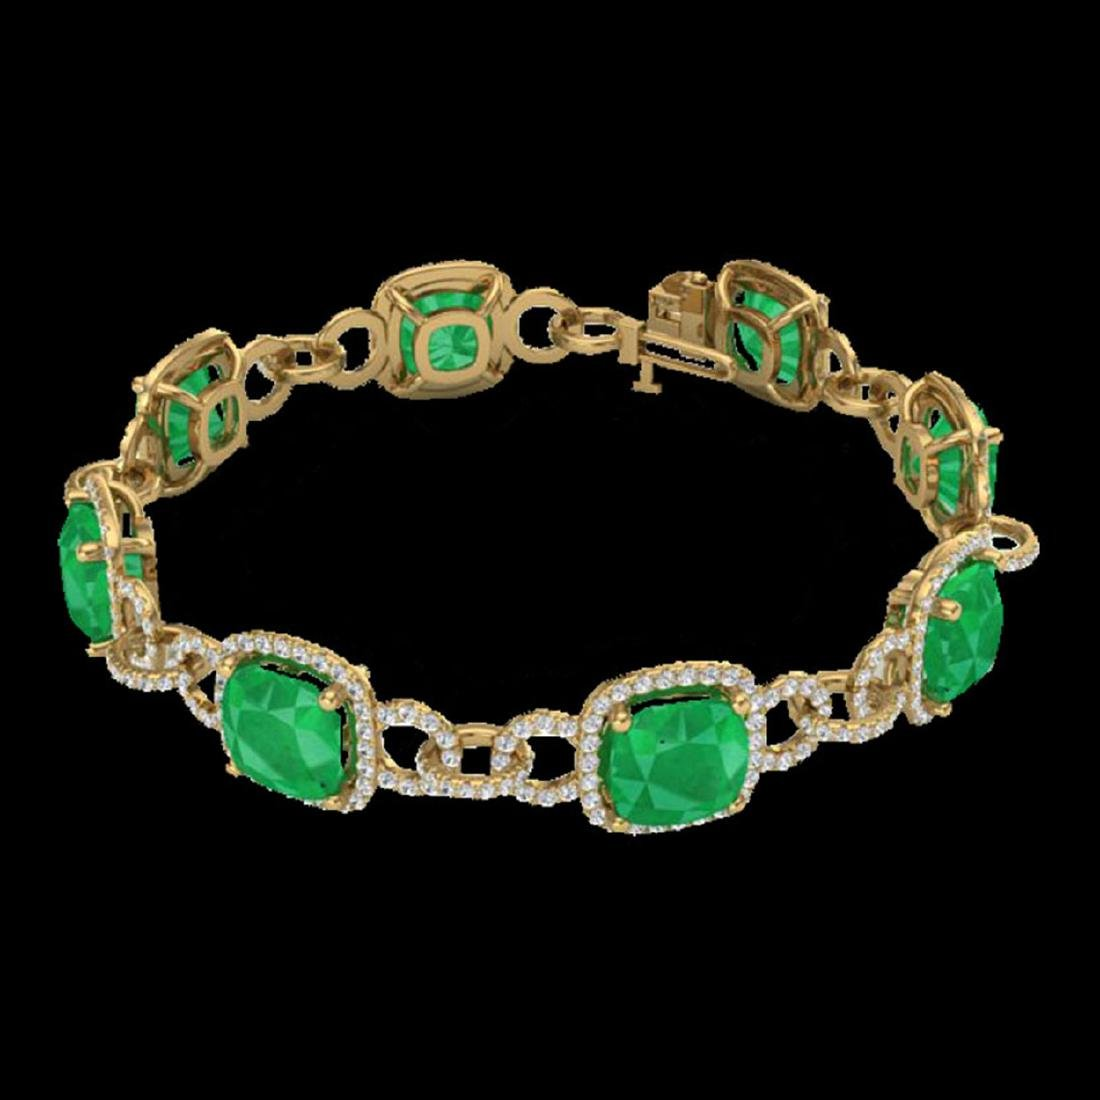 25 ctw Emerald & VS/SI Diamond Bracelet 14K Yellow Gold - 2